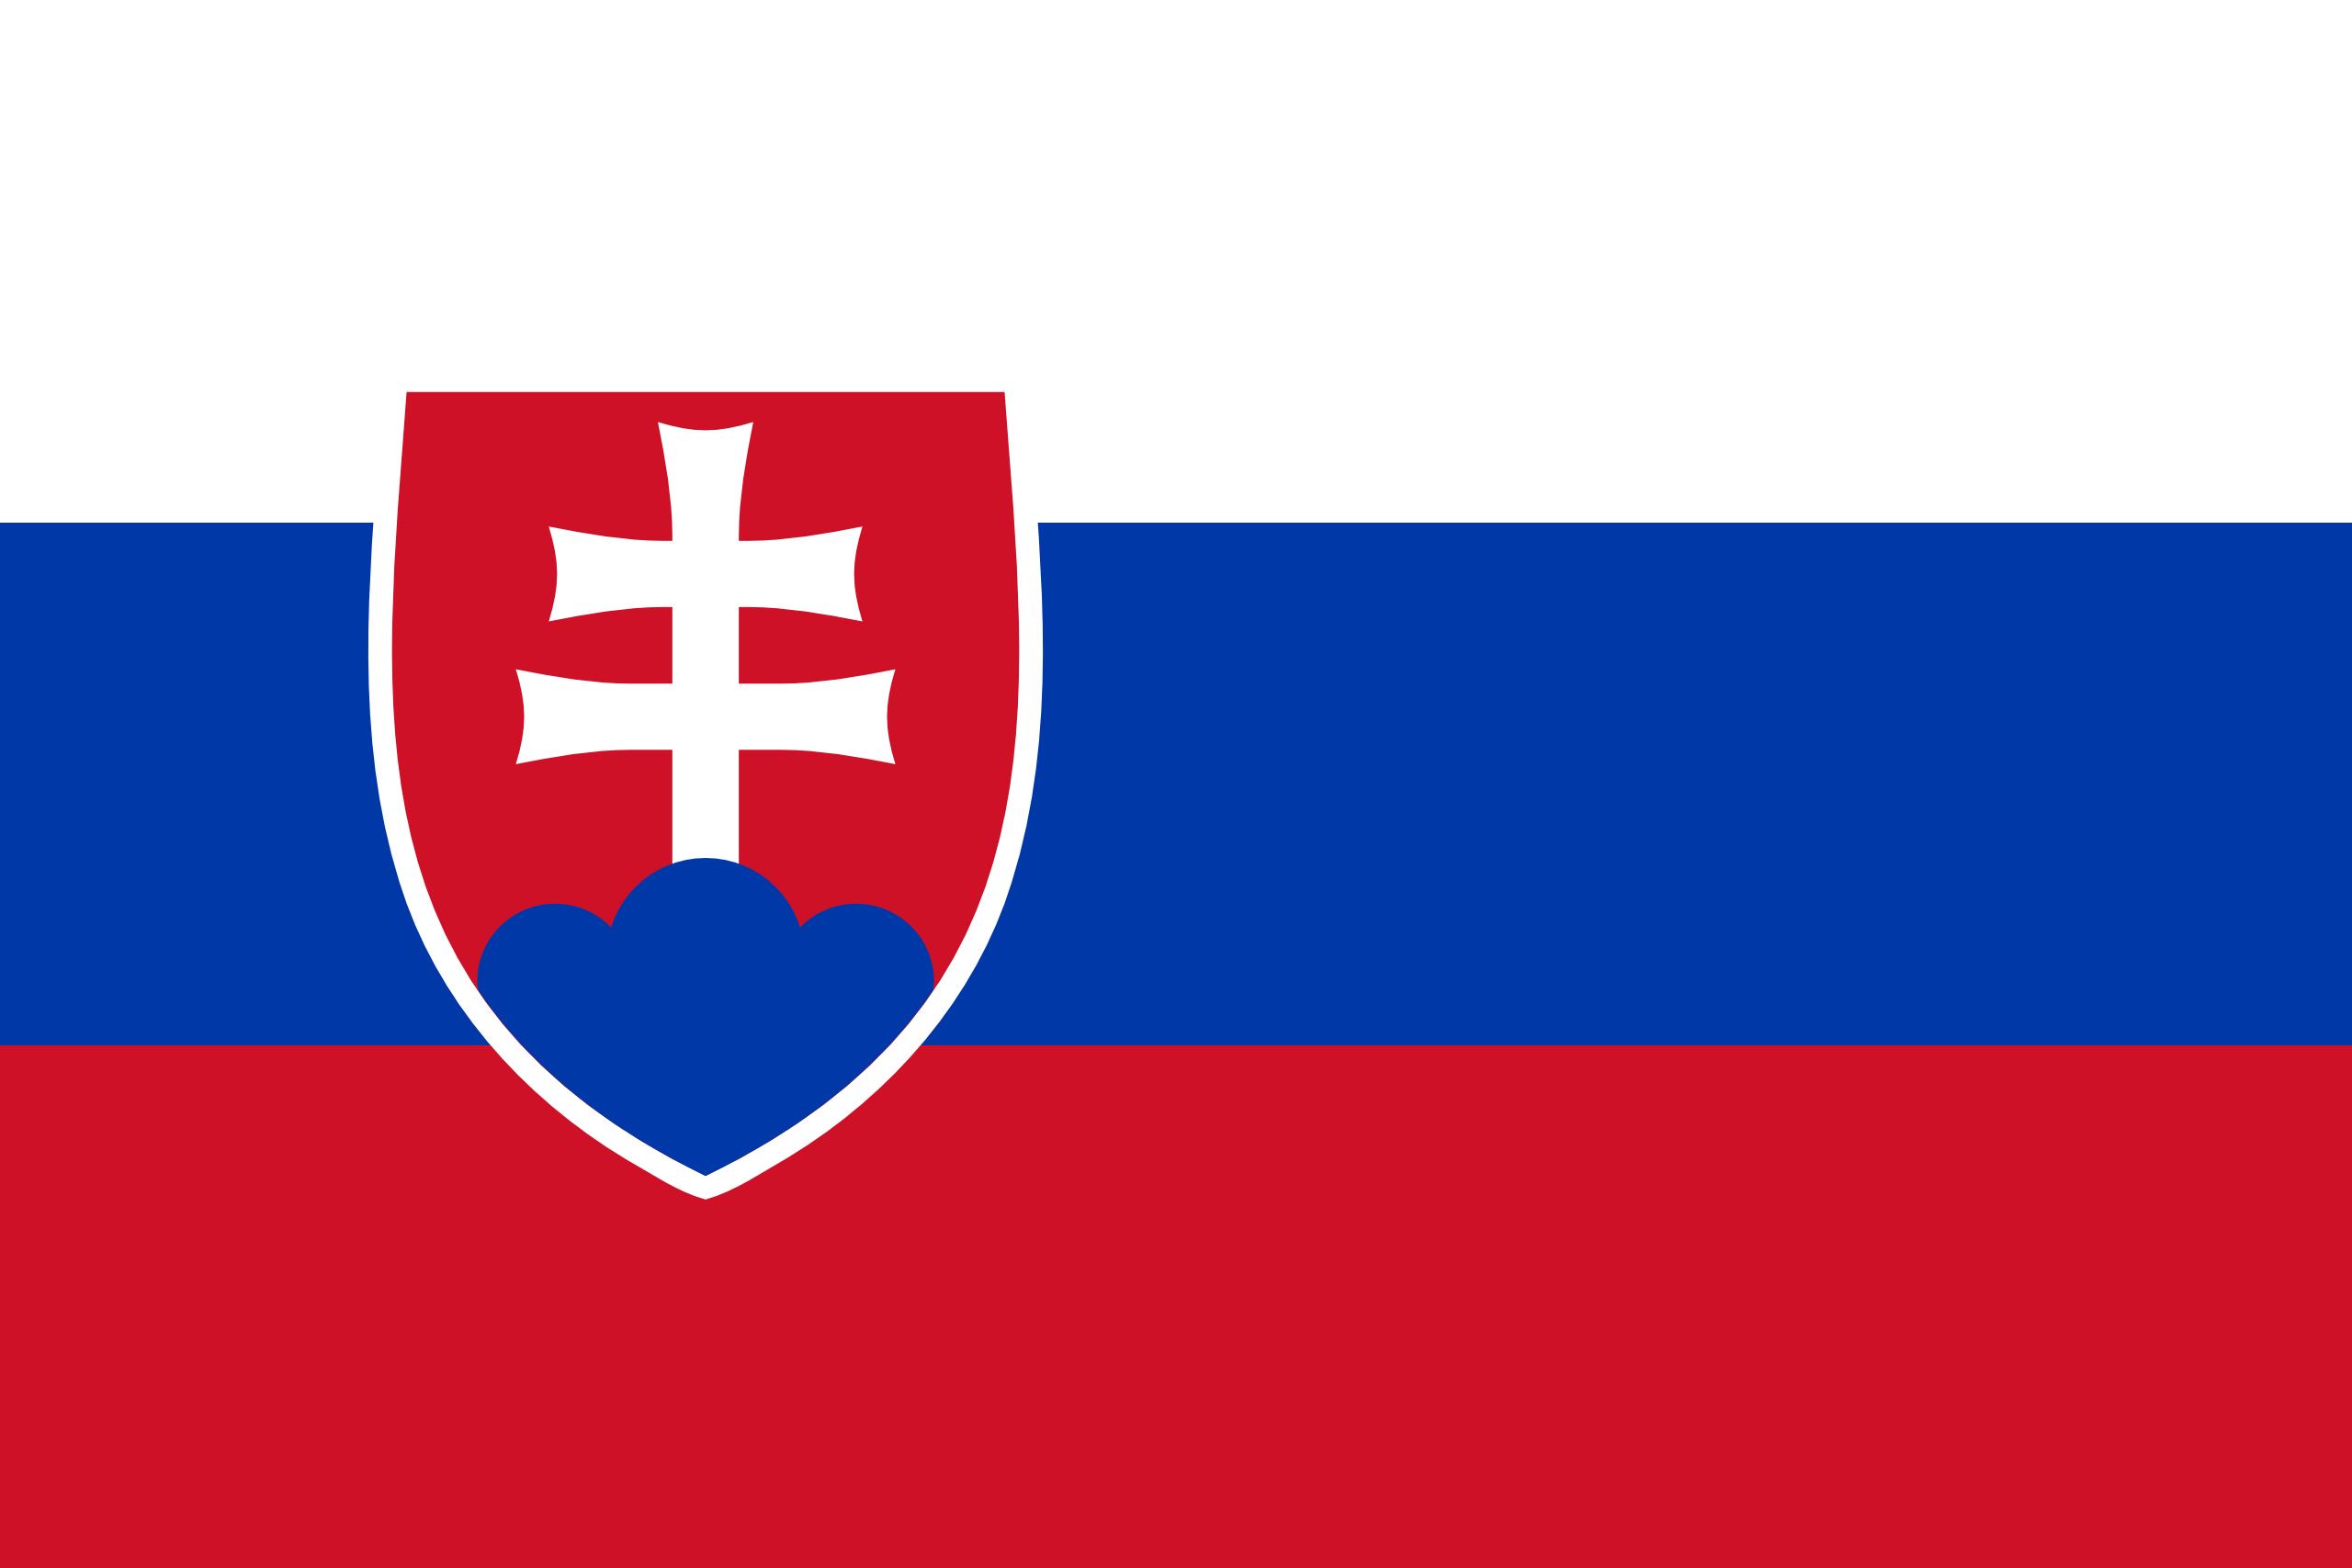 eslovaquia, 国家, 会徽, 徽标, 符号 - 高清壁纸 - 教授-falken.com